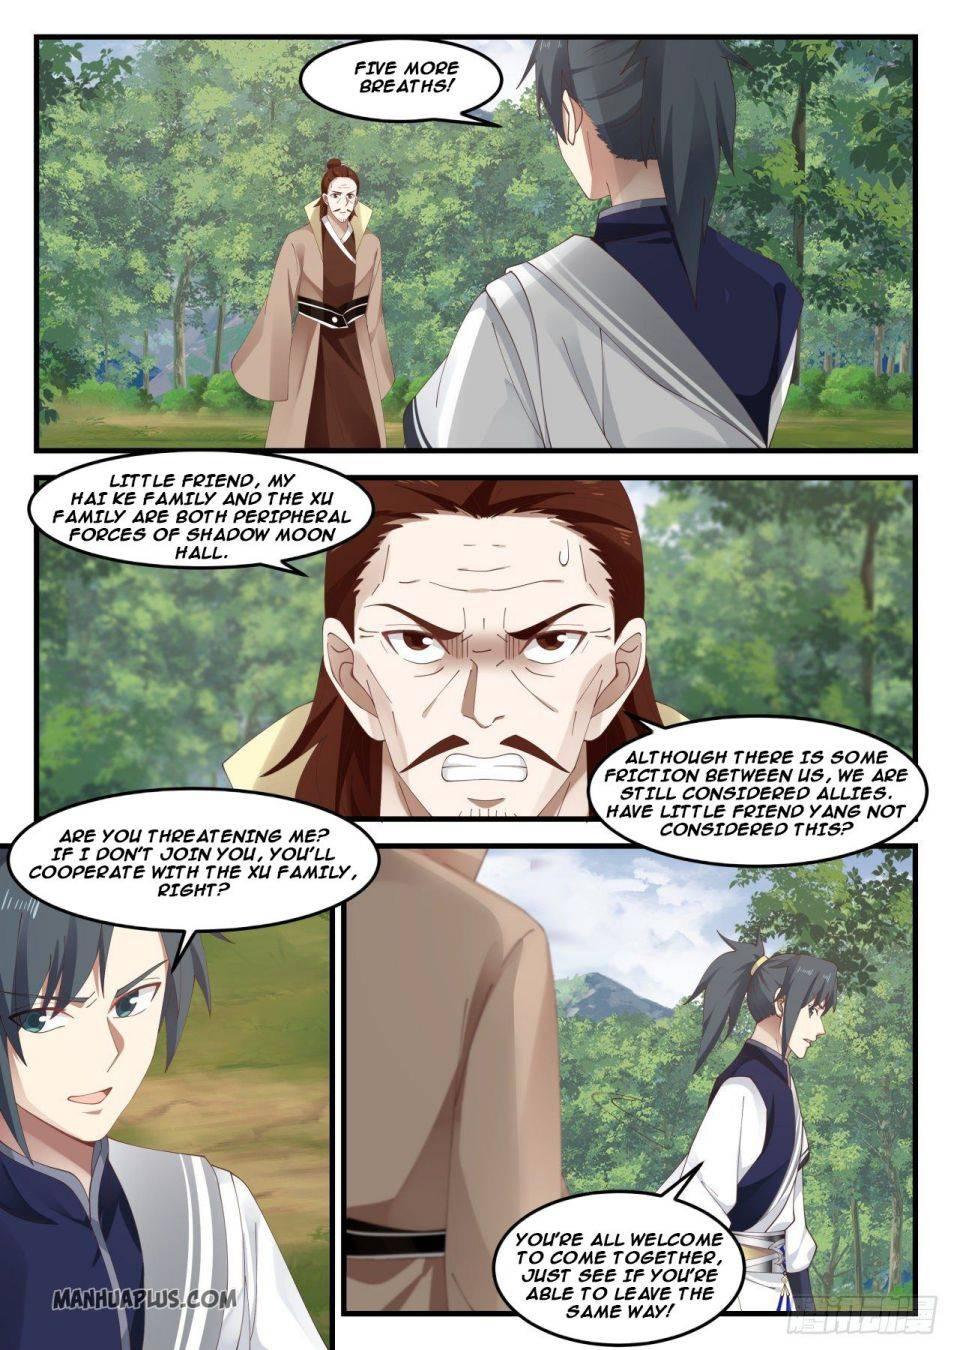 https://manga.mangadogs.com/comics/pic4/17/21329/3003127/9ab093022178275cc080e414e2c819fa.jpg Page 1